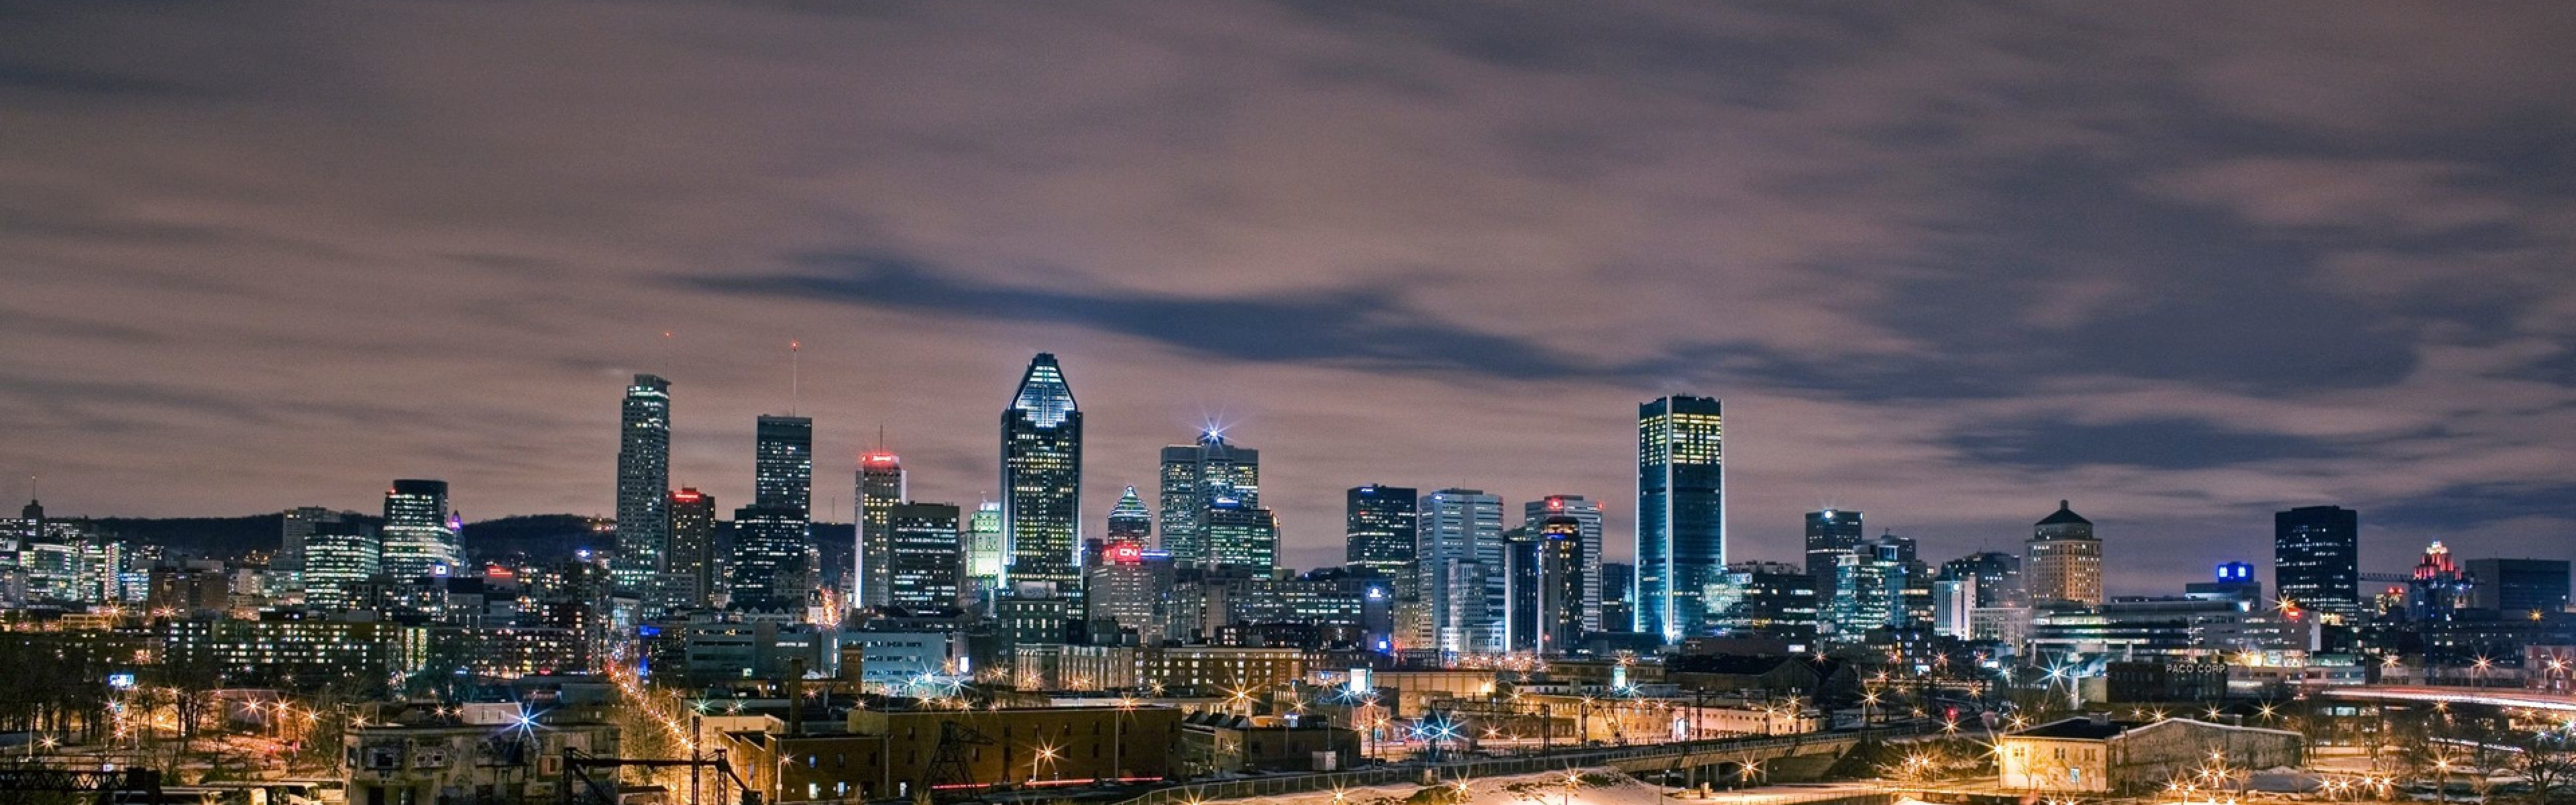 Download 3840x1200 Montreal Canada Night Building Wallpaper 3840x1200